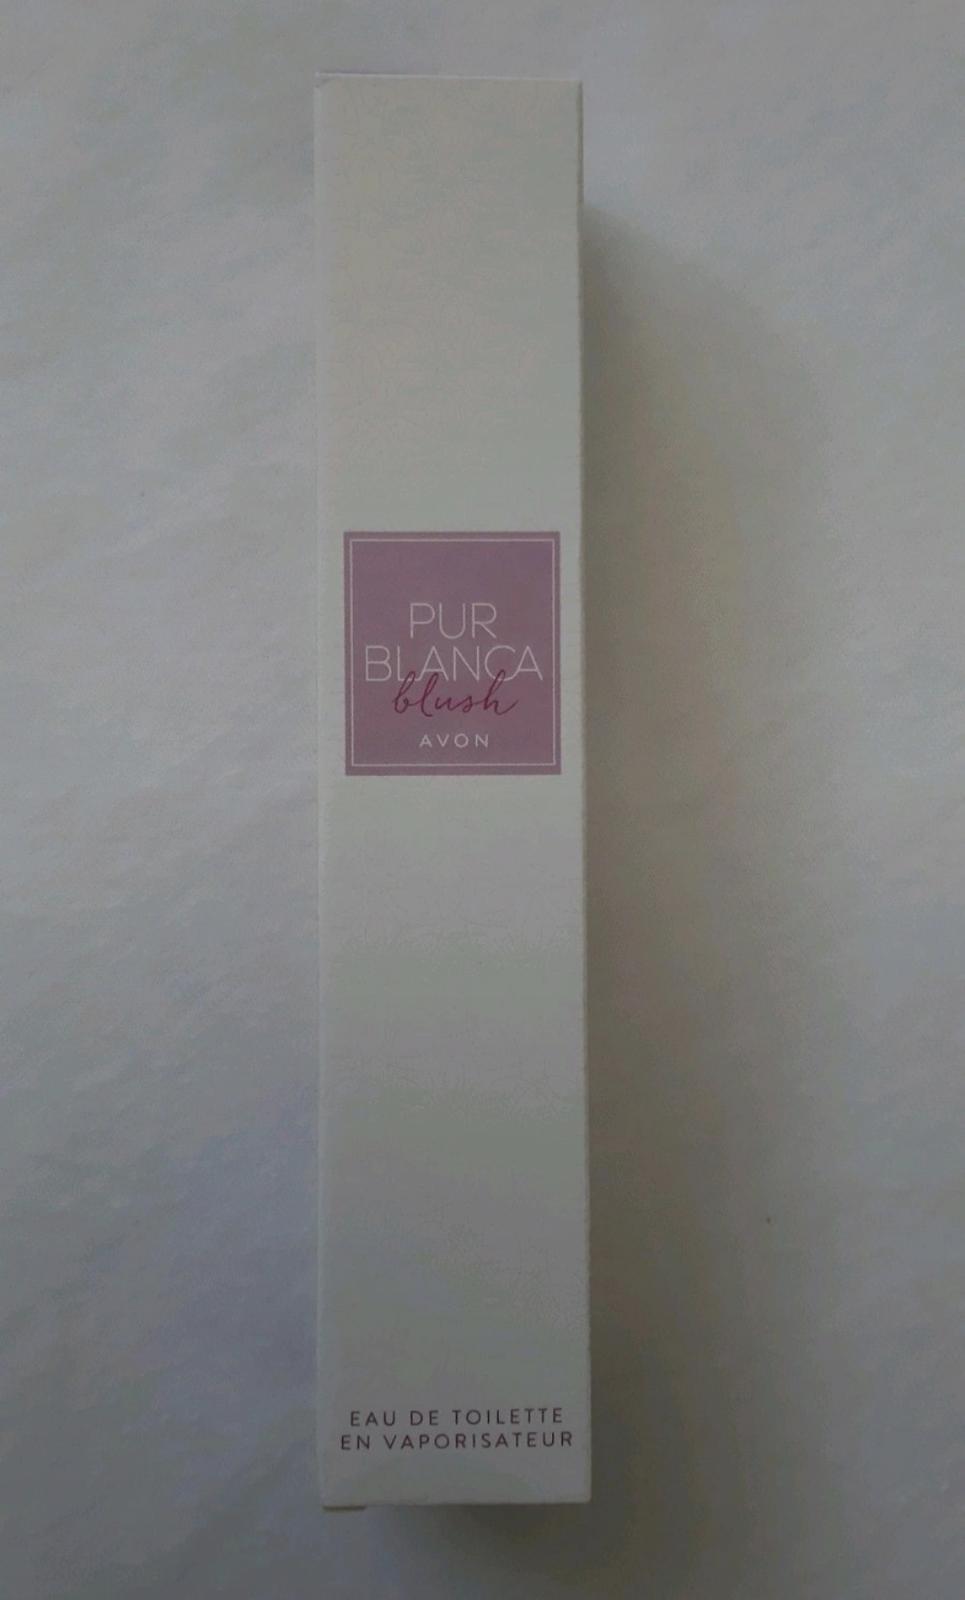 Pur Blanca Blush - Obrázek č. 1